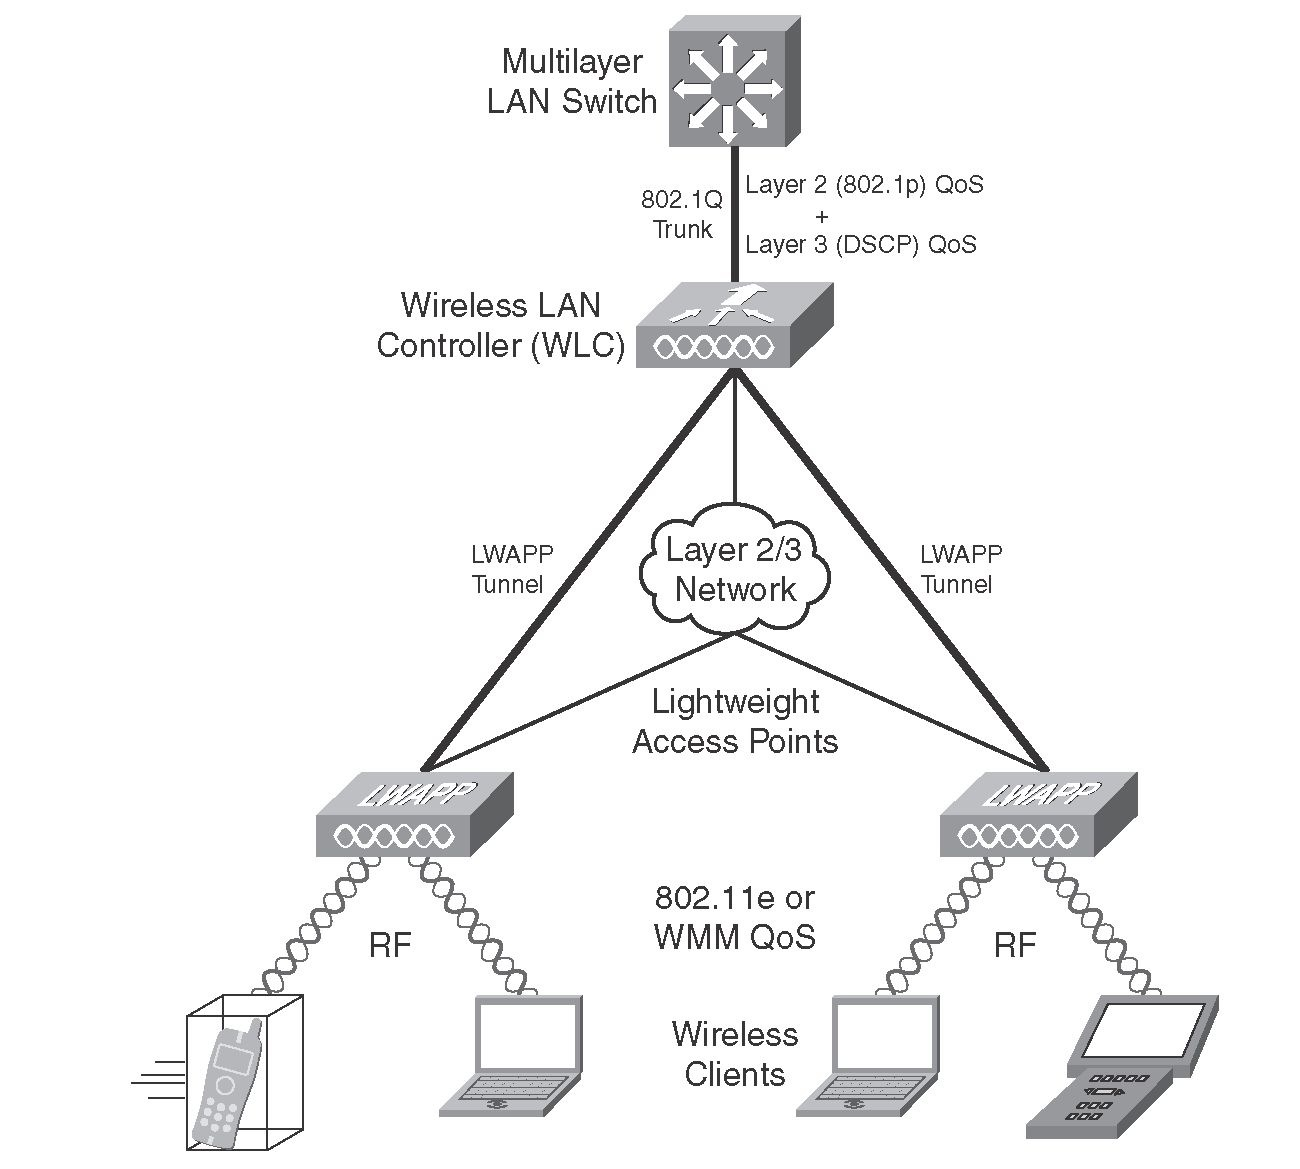 Current Wireless LAN QoS Implementation